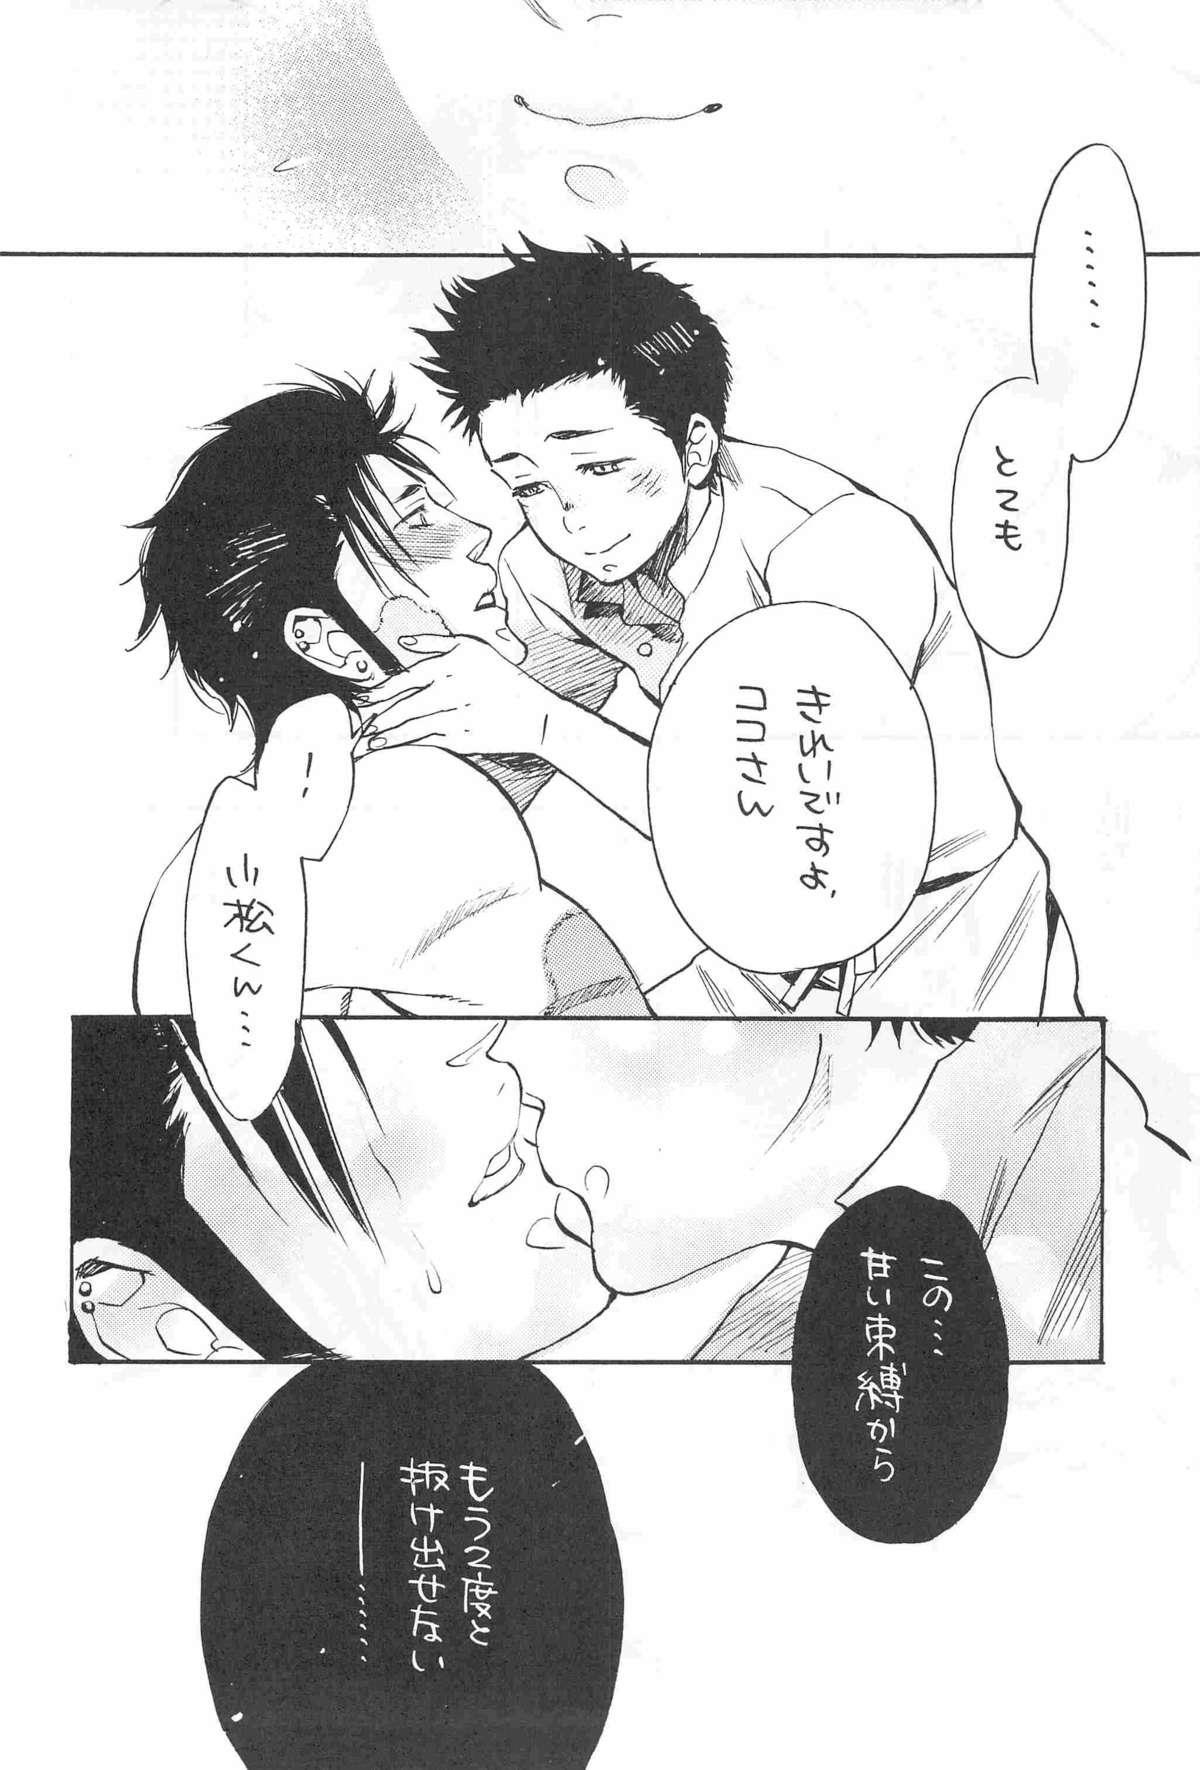 [Kijima Hyougo,Jun'ai Meringue-don,RIN!] [msbt] (Toriko) 33